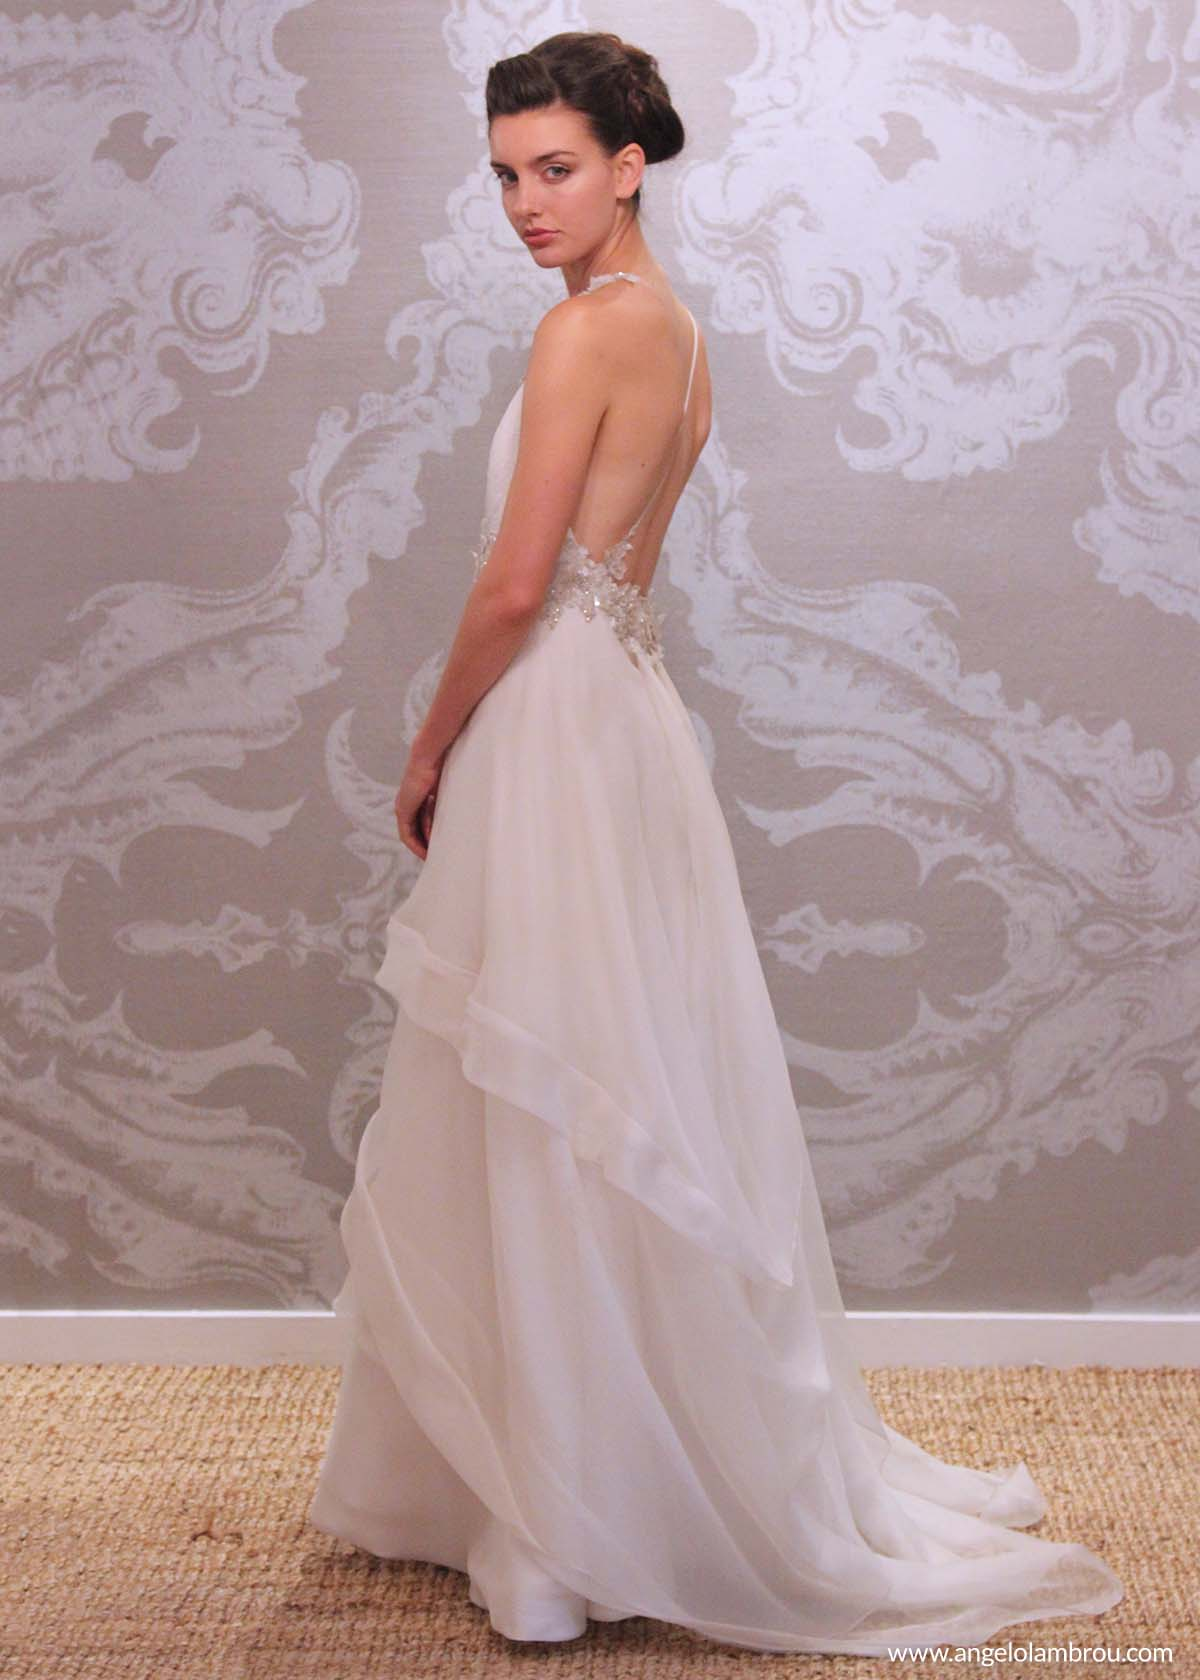 Custom handmade wedding evening gowns angelo lambrou for Custom made wedding dresses nyc